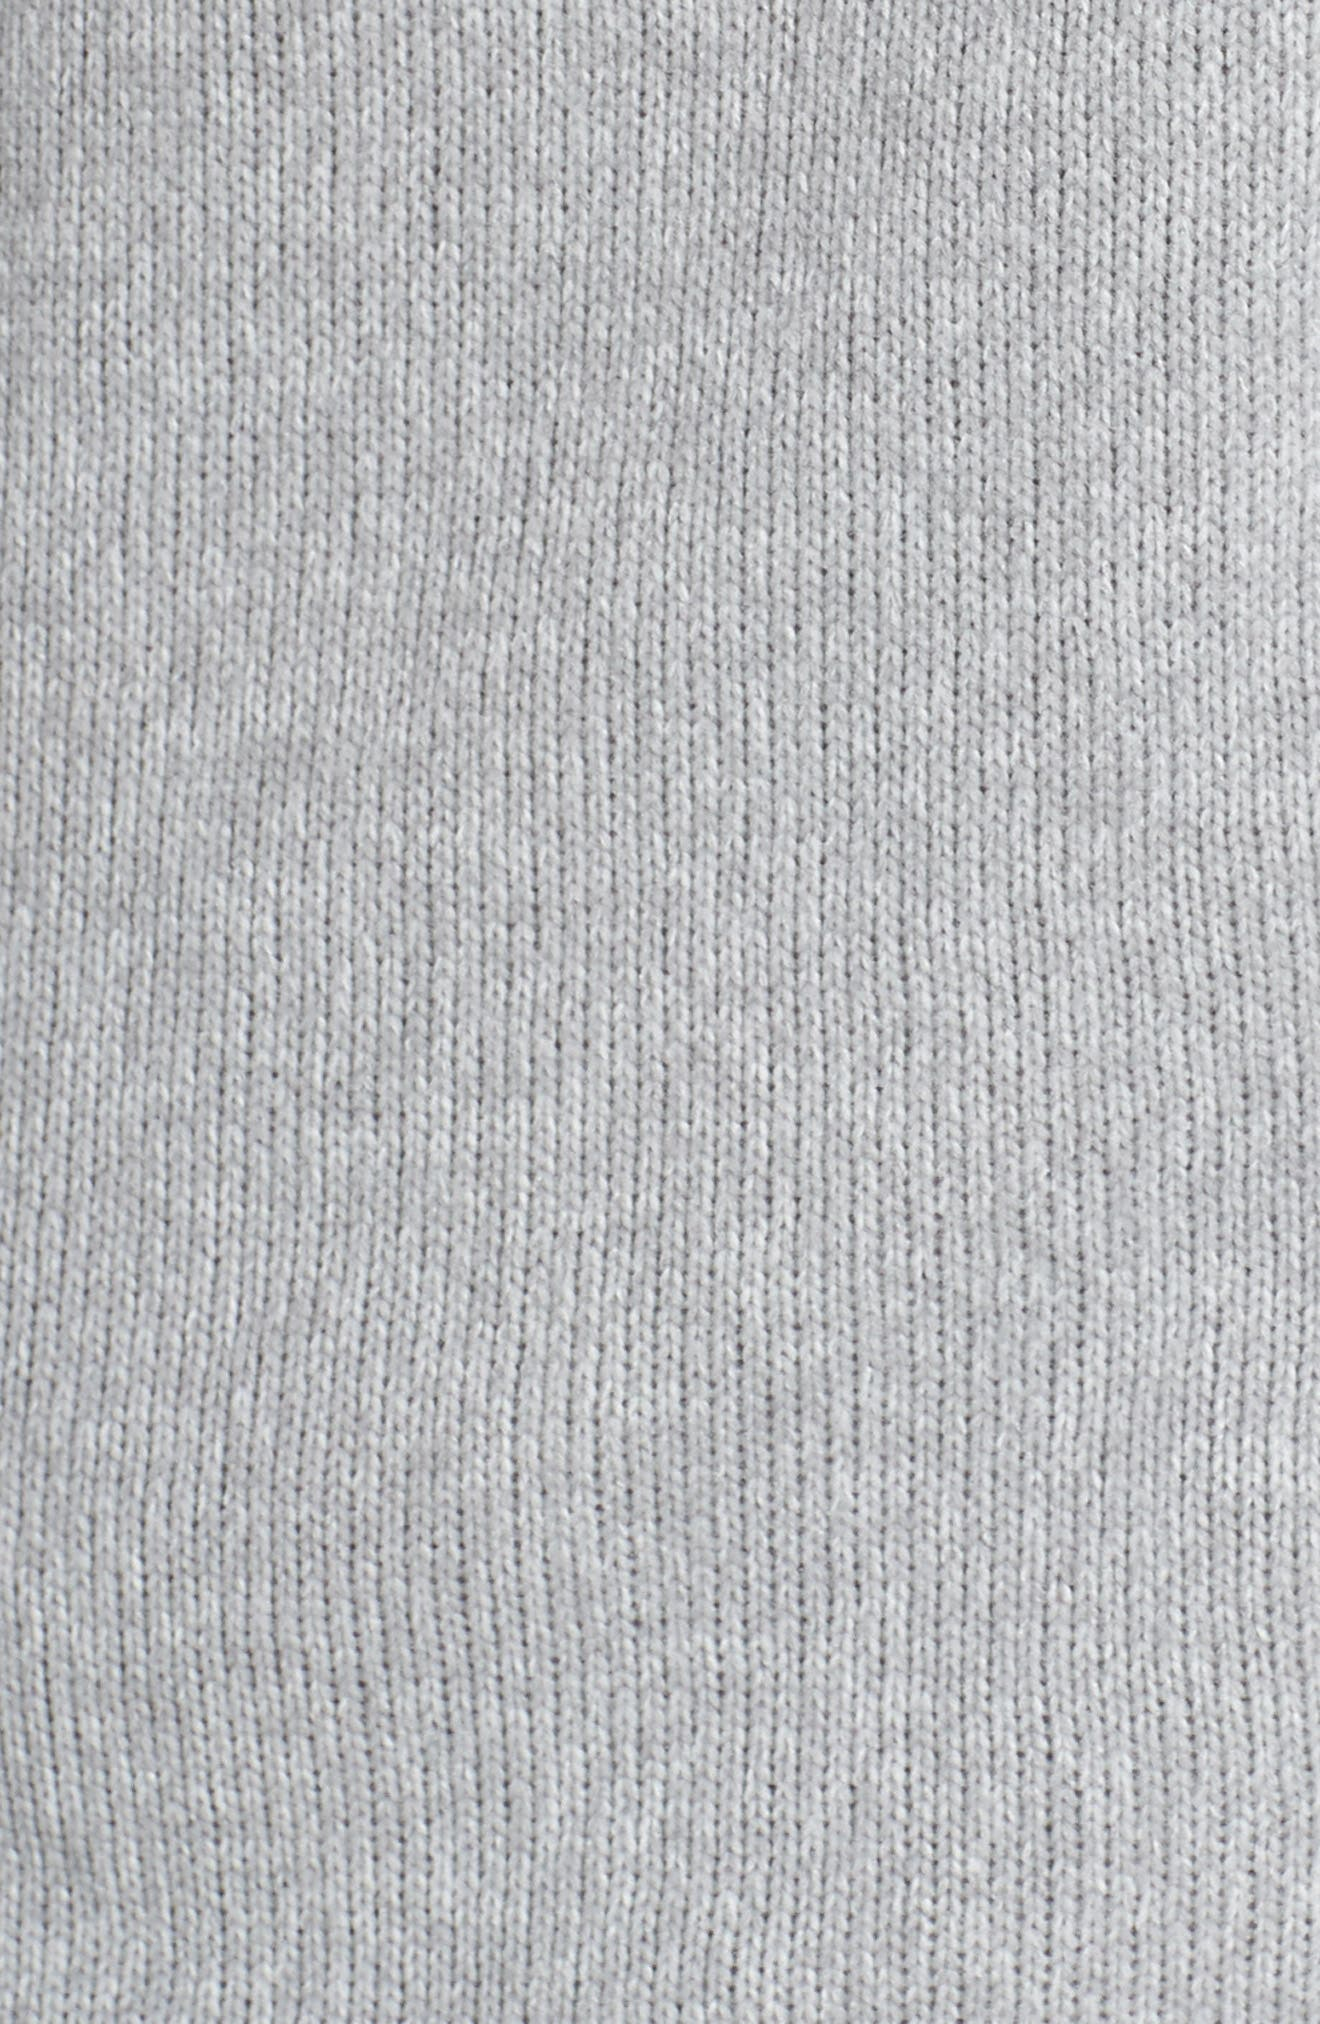 Performance Better Sweater Hoodie,                             Alternate thumbnail 7, color,                             DRIFT GREY